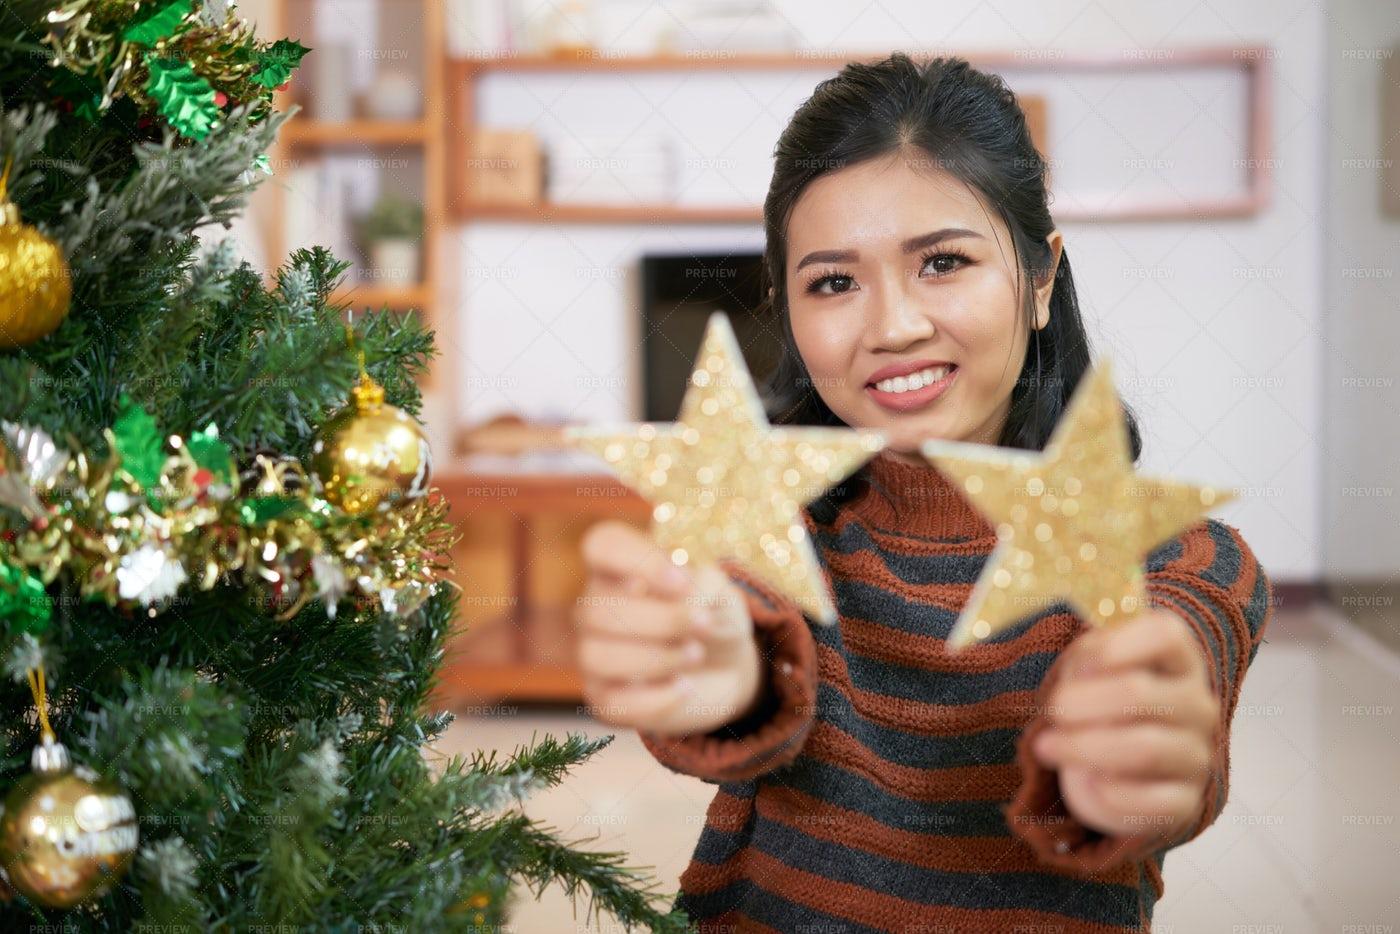 Enjoying Preparing For Christmas: Stock Photos